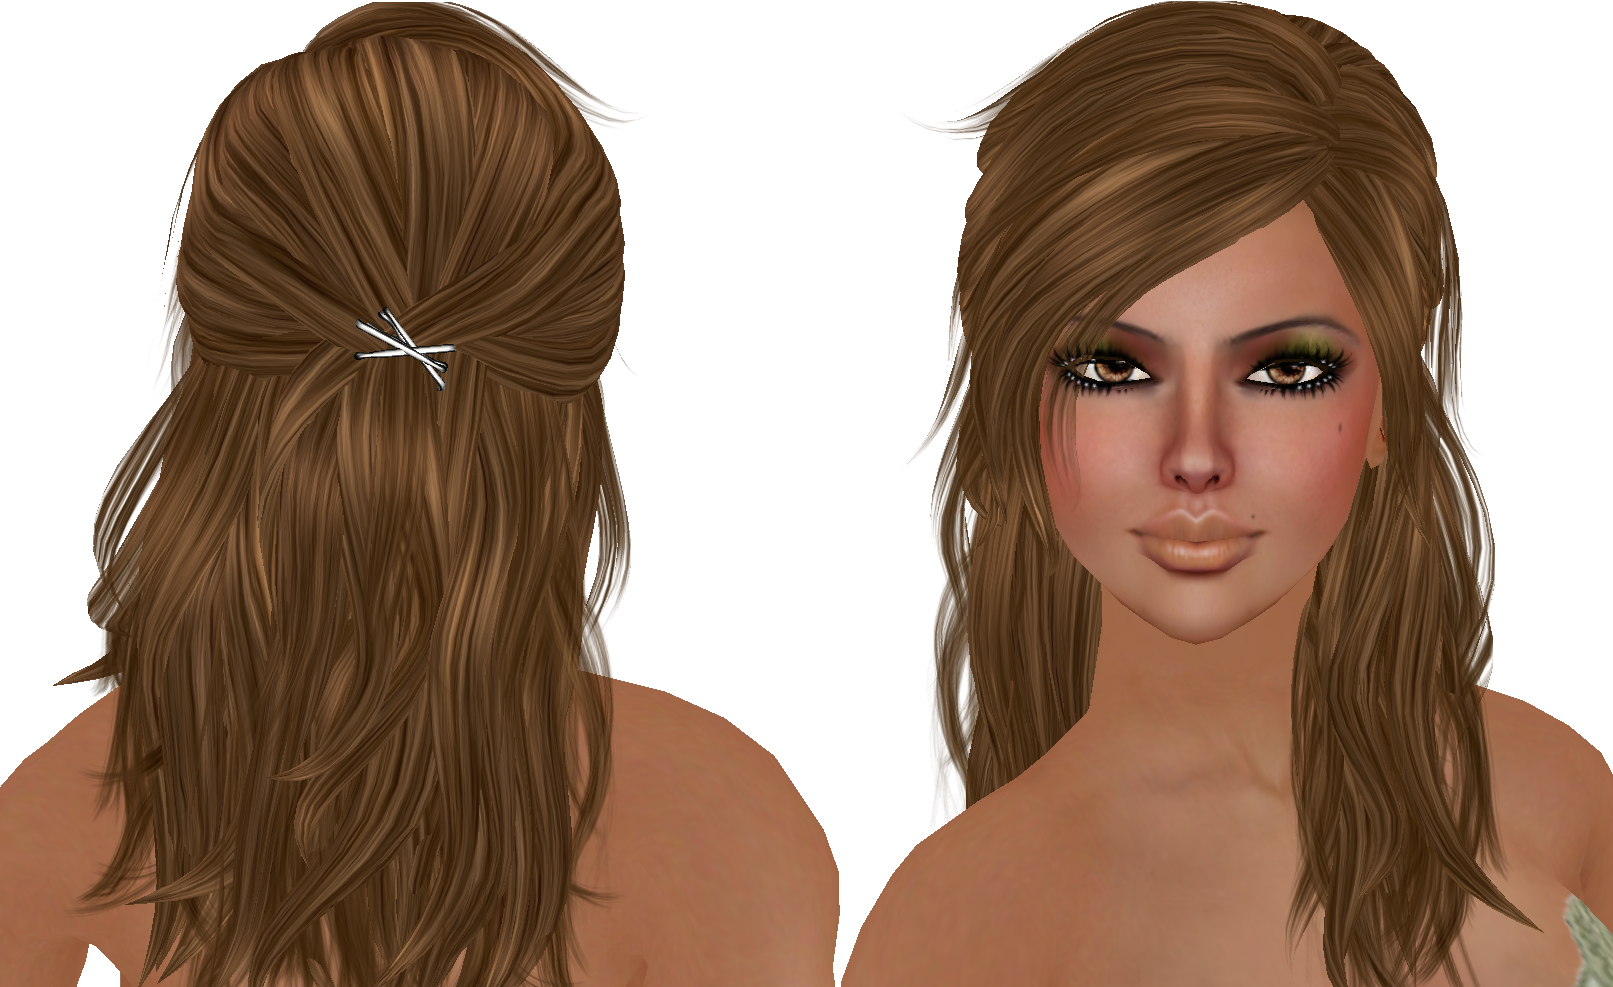 Cute Pull Back Long Layered Hair Long Layered Hair With Side Bangs Hair